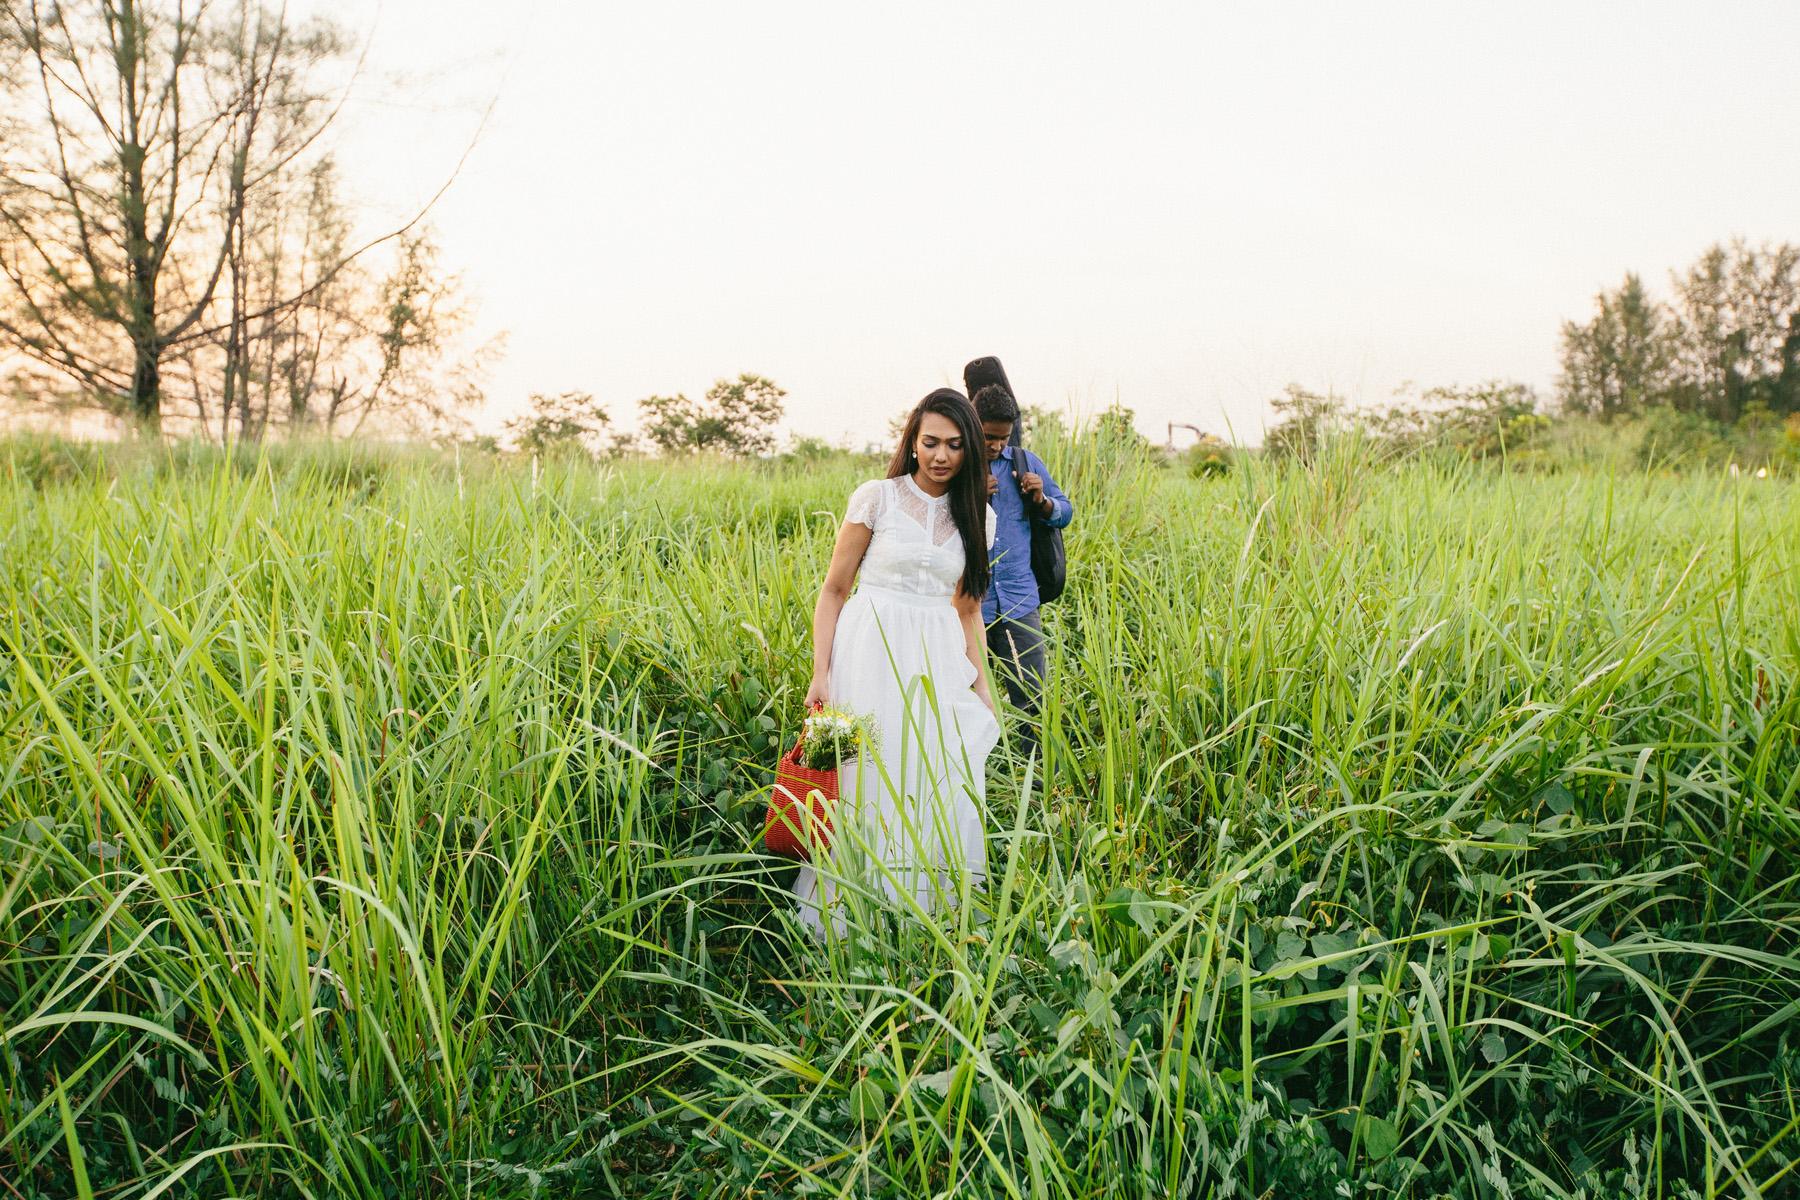 singapore-wedding-travel-photographer-abigail-caleb-wedding-wmt-08.jpg